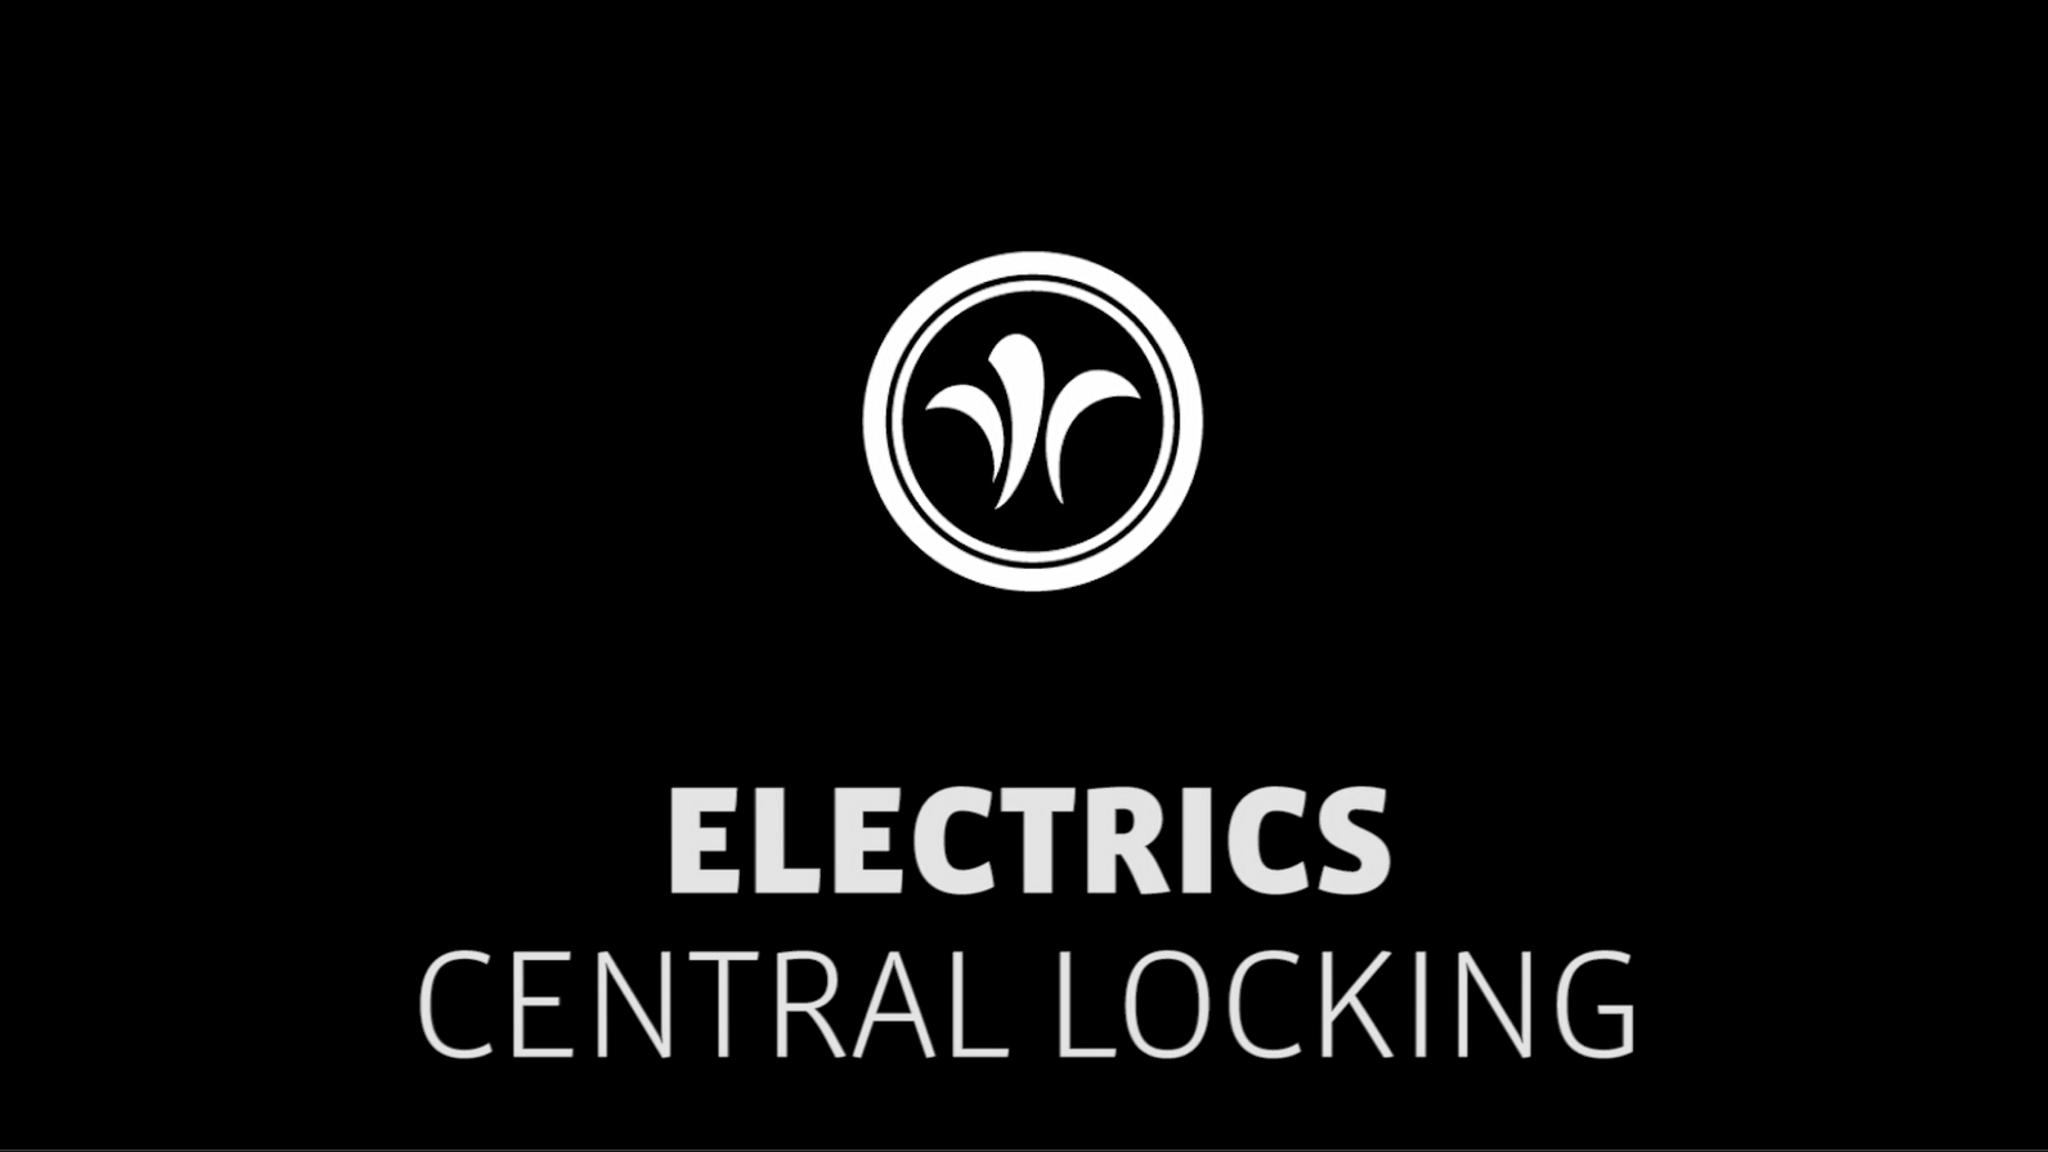 motorhome central locks // niesmann+bischoff - camper (model ARTO) // 2019 // EL5